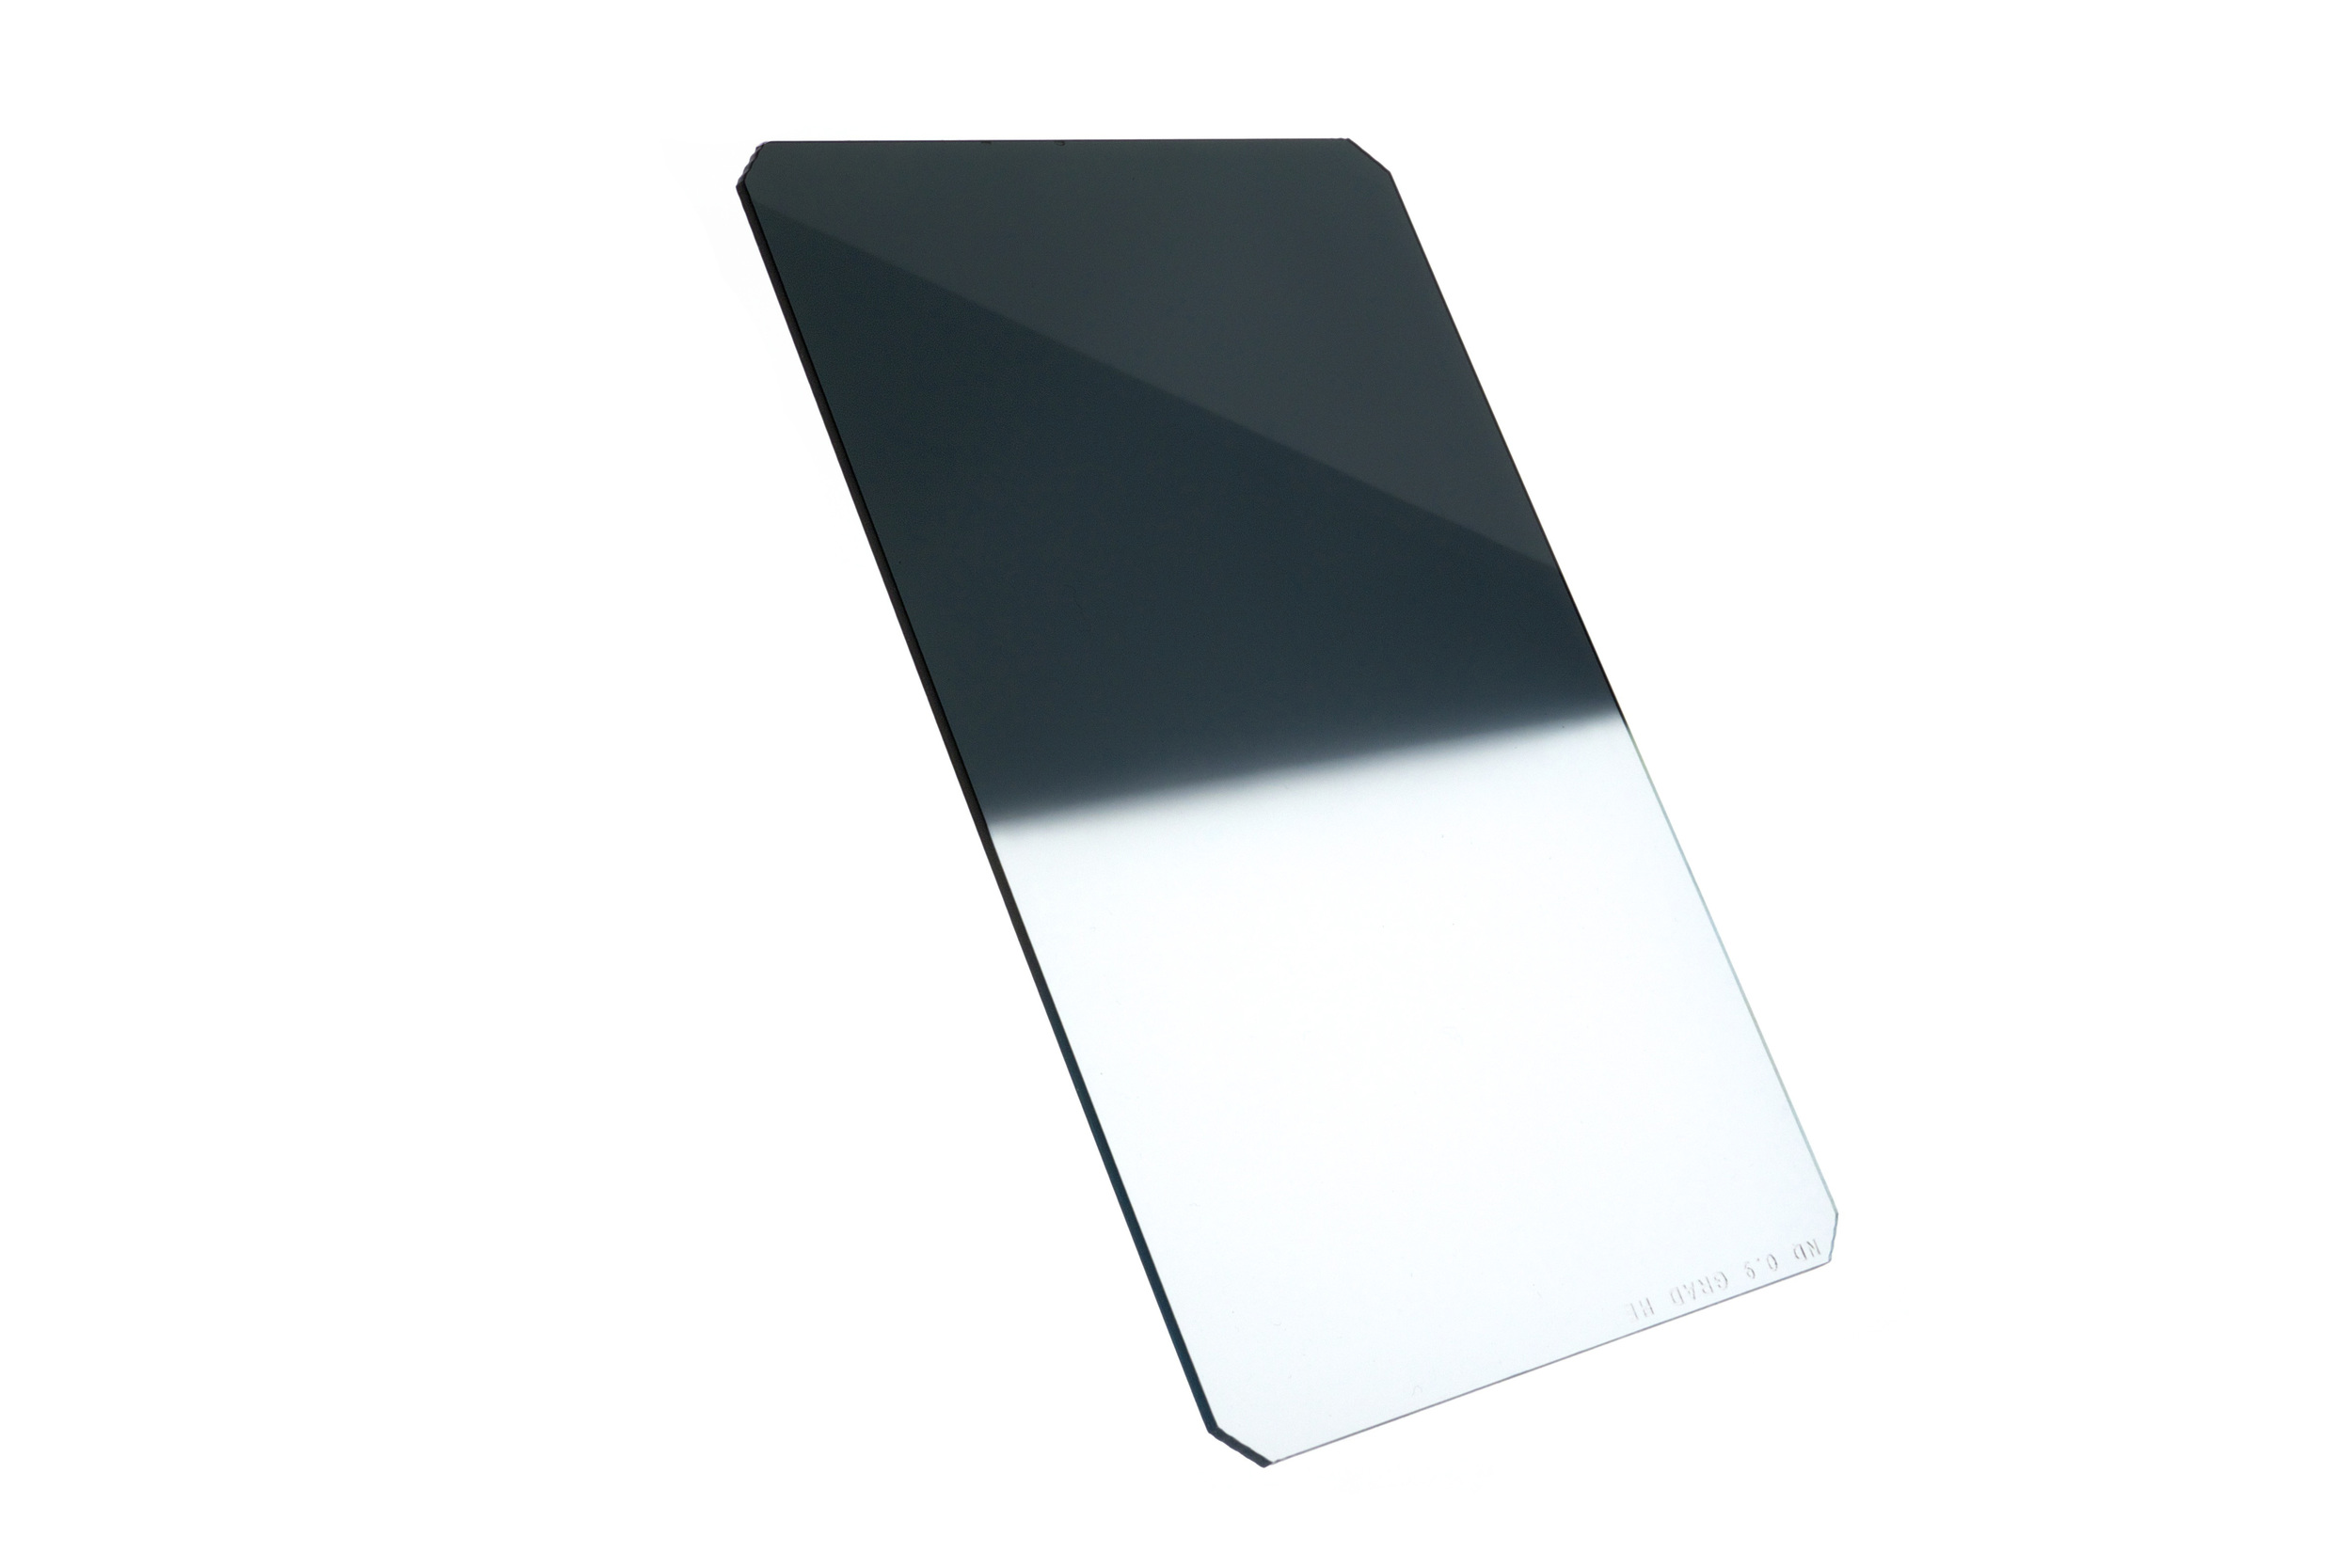 Formatt-Hitech 100x150mm Firecrest Soft Edge Grad Neutral Density 0.6 Filter